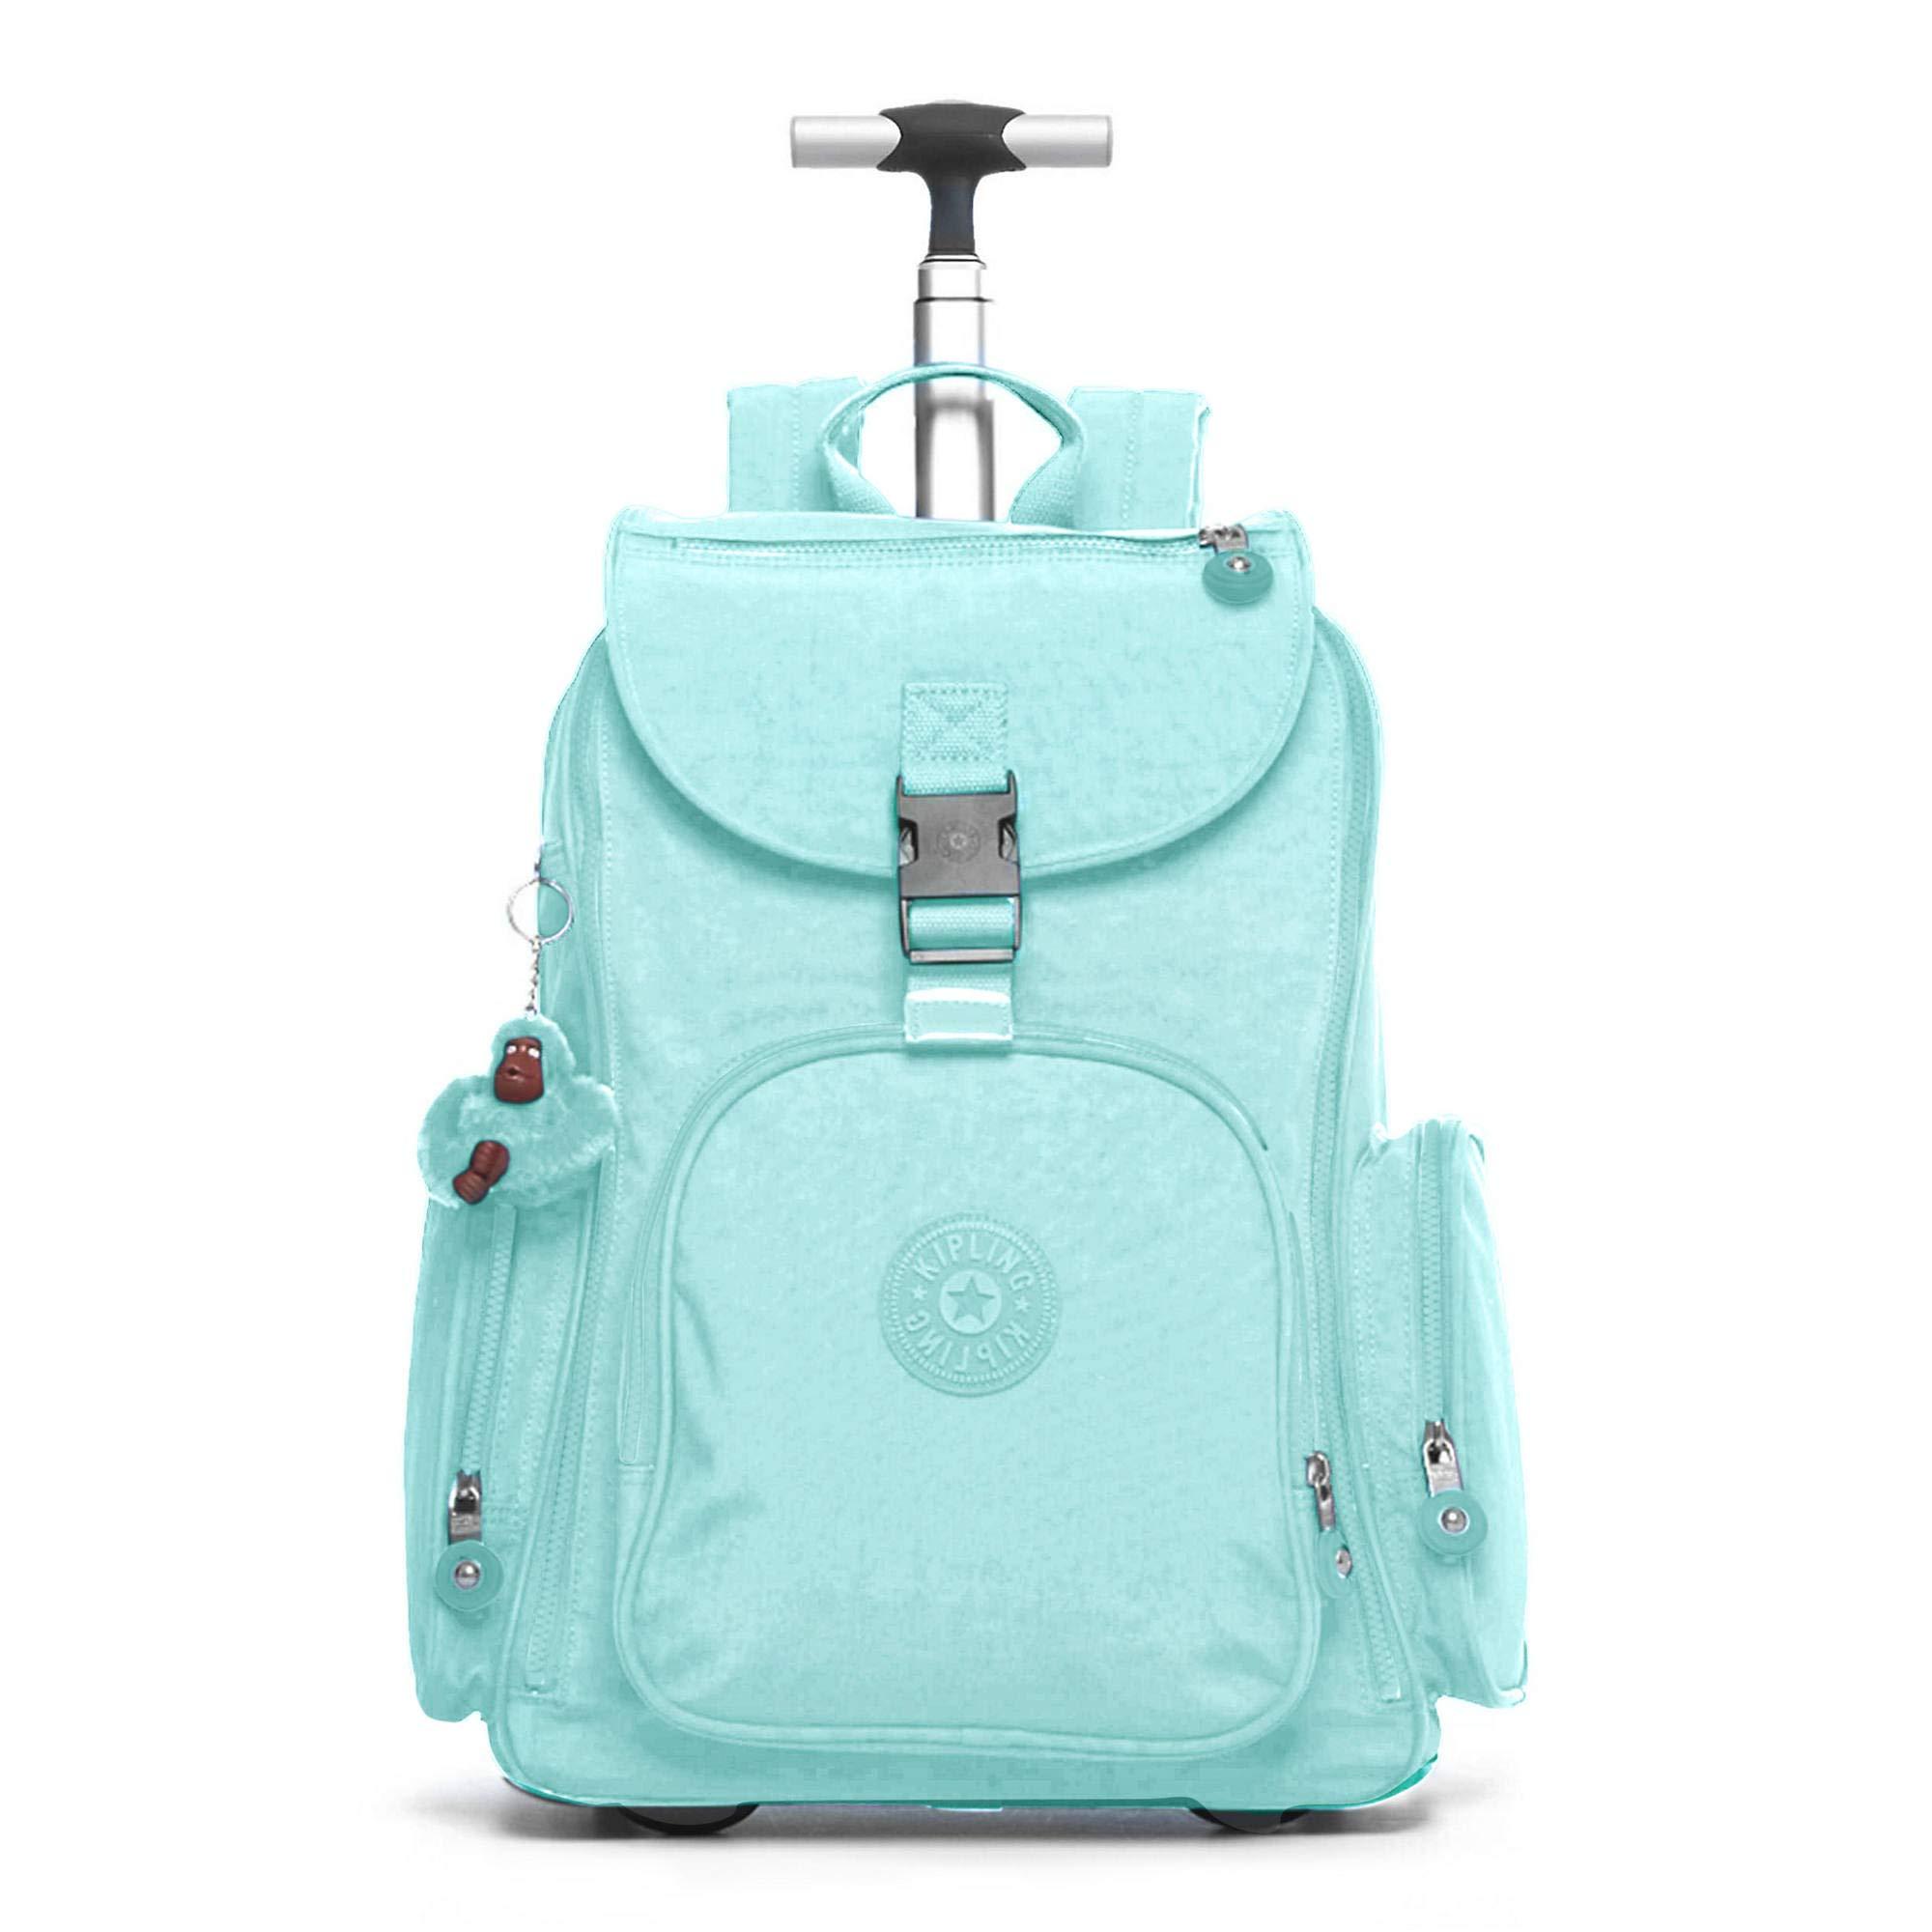 Kipling Alcatraz Ii Large Rolling Laptop Backpack Fresh Teal Tonal by Kipling